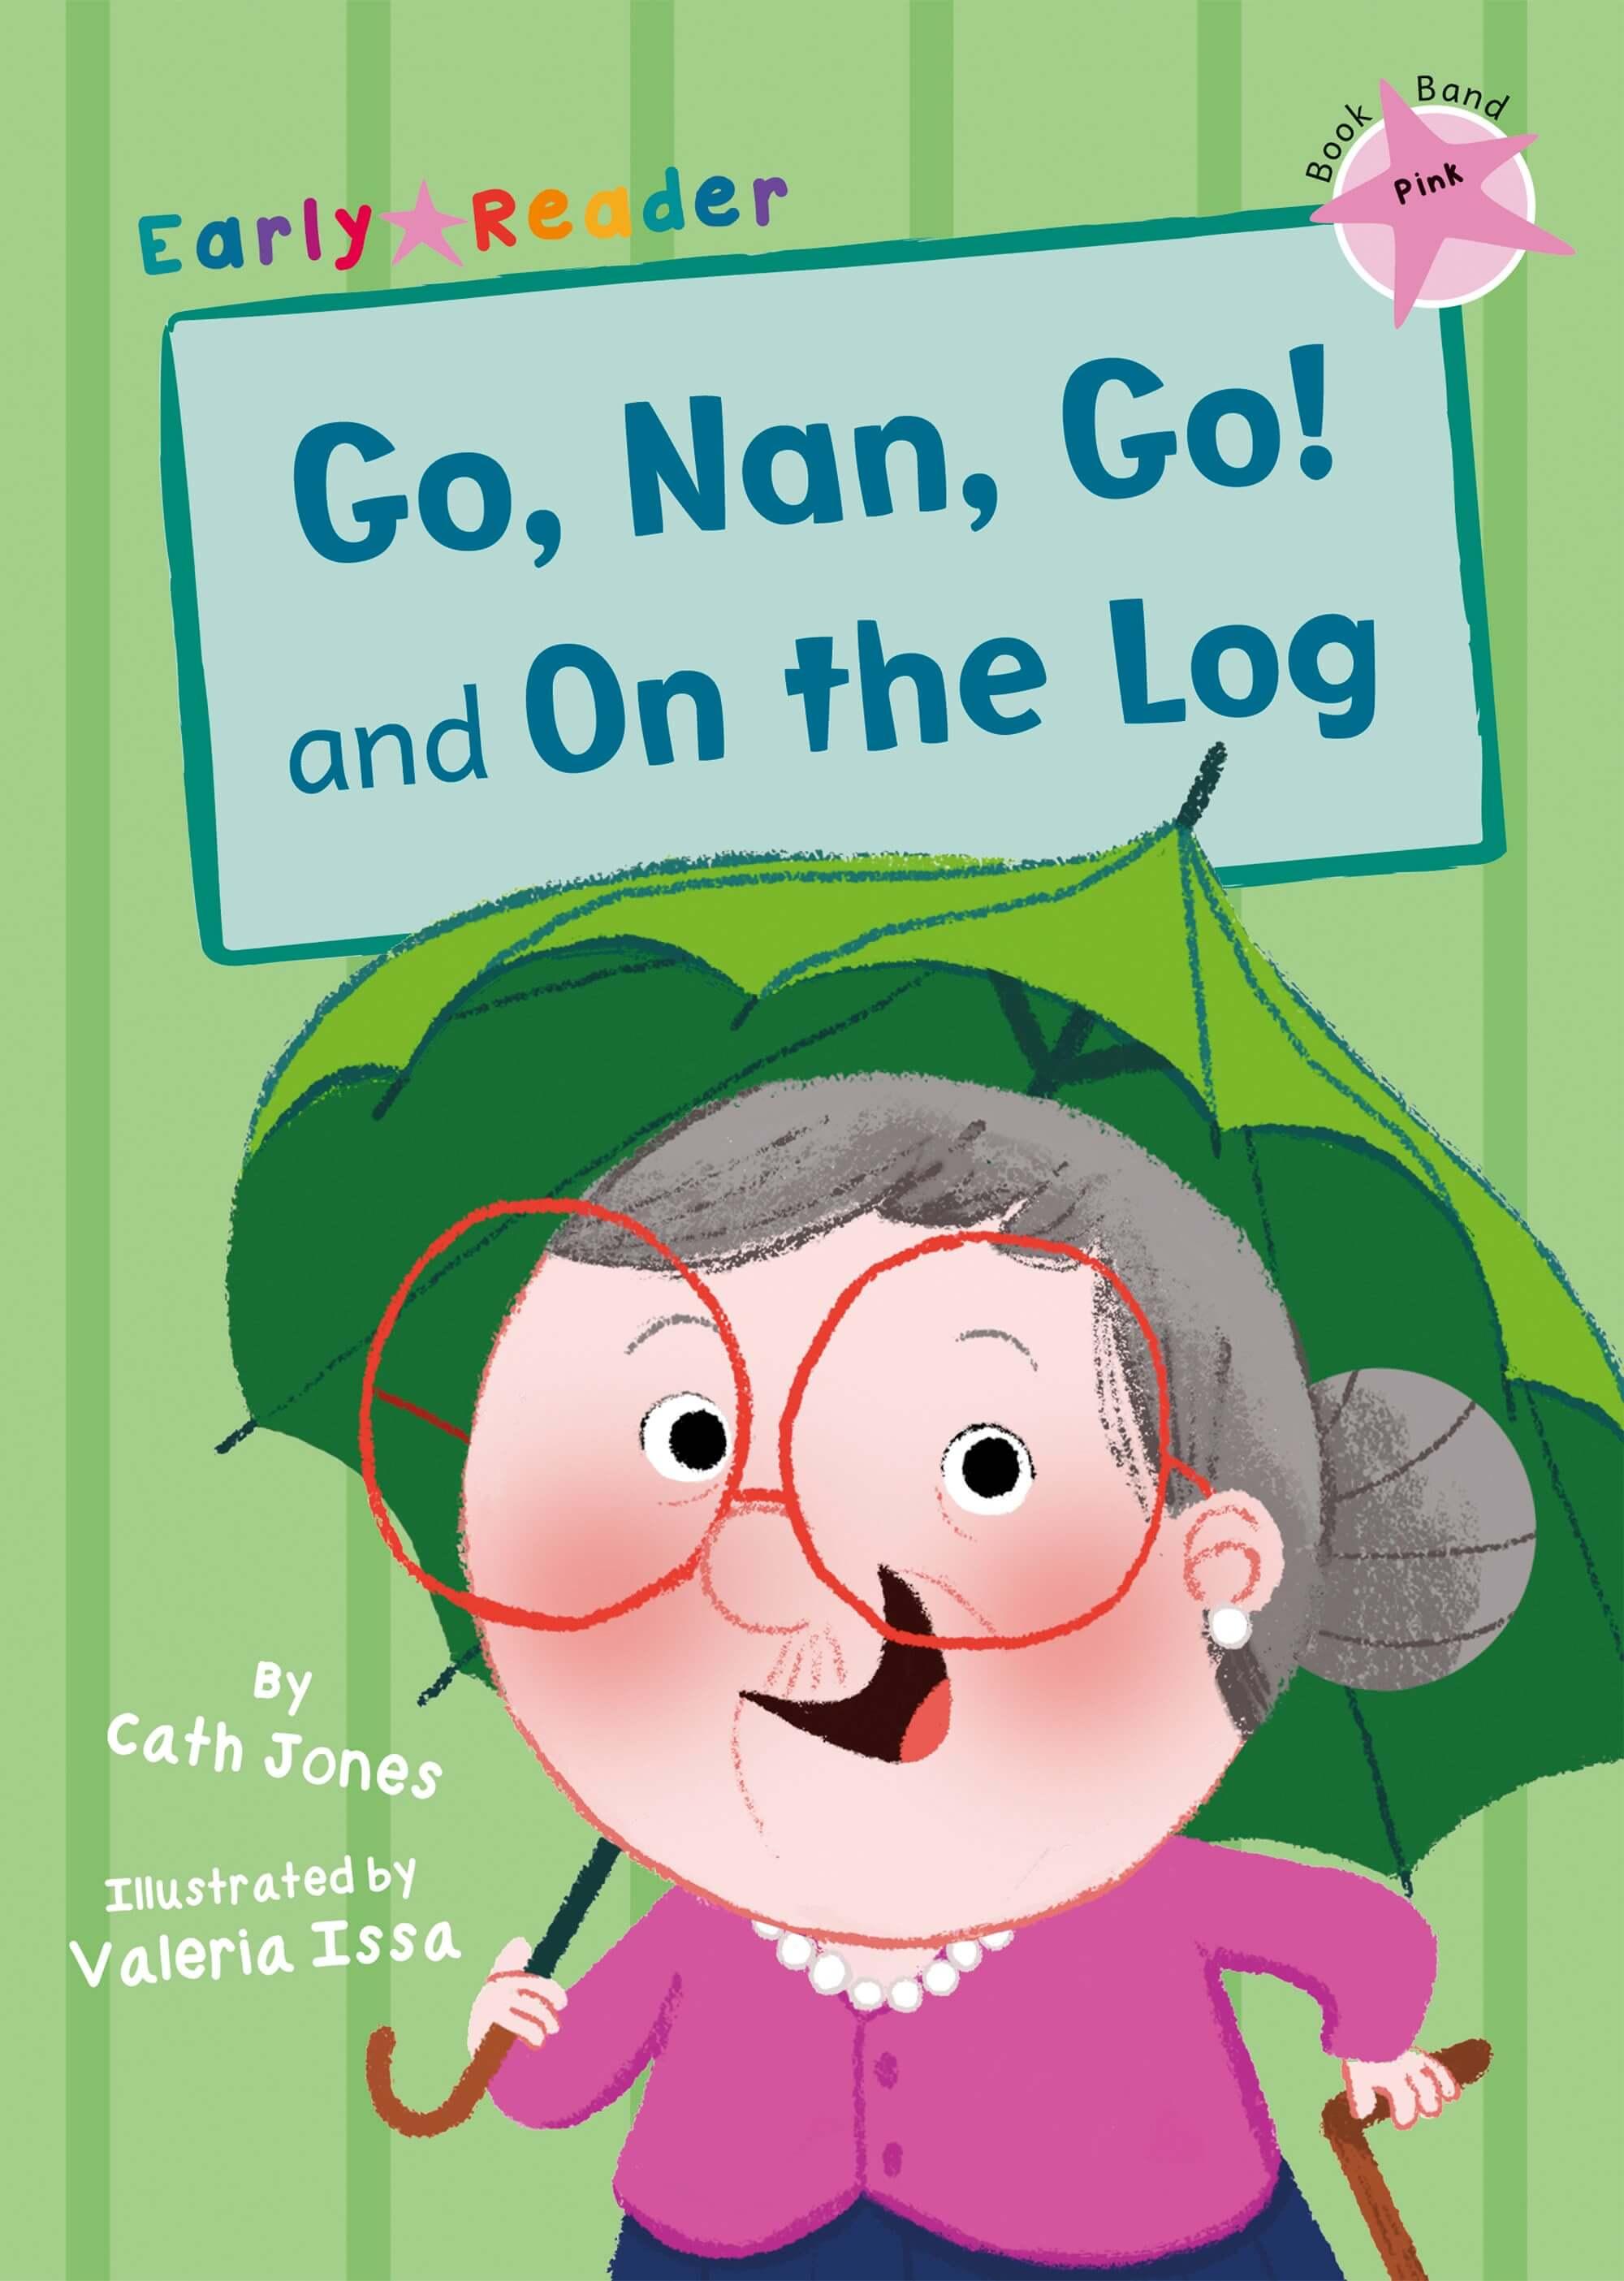 Go Nan Go + On the Log Cover